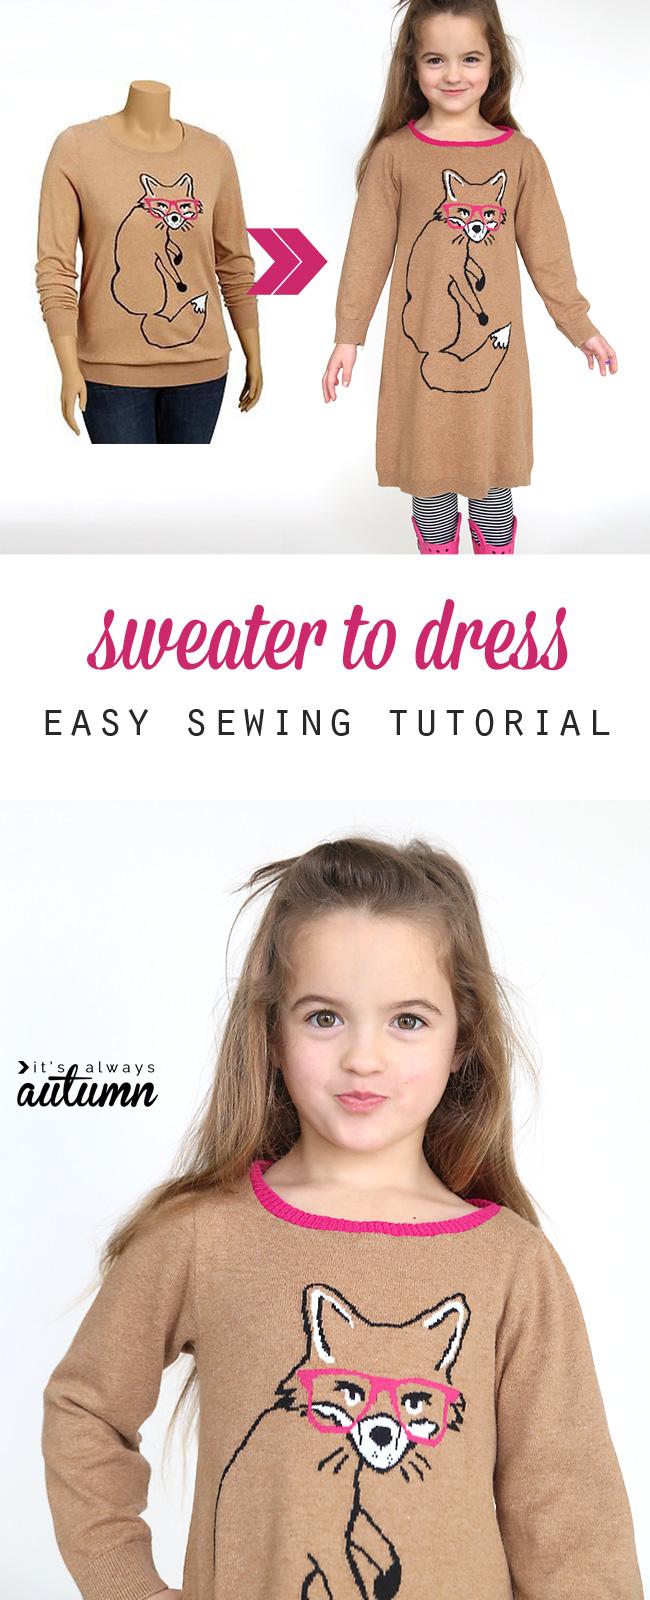 Make A Sweater Into A Dress 96